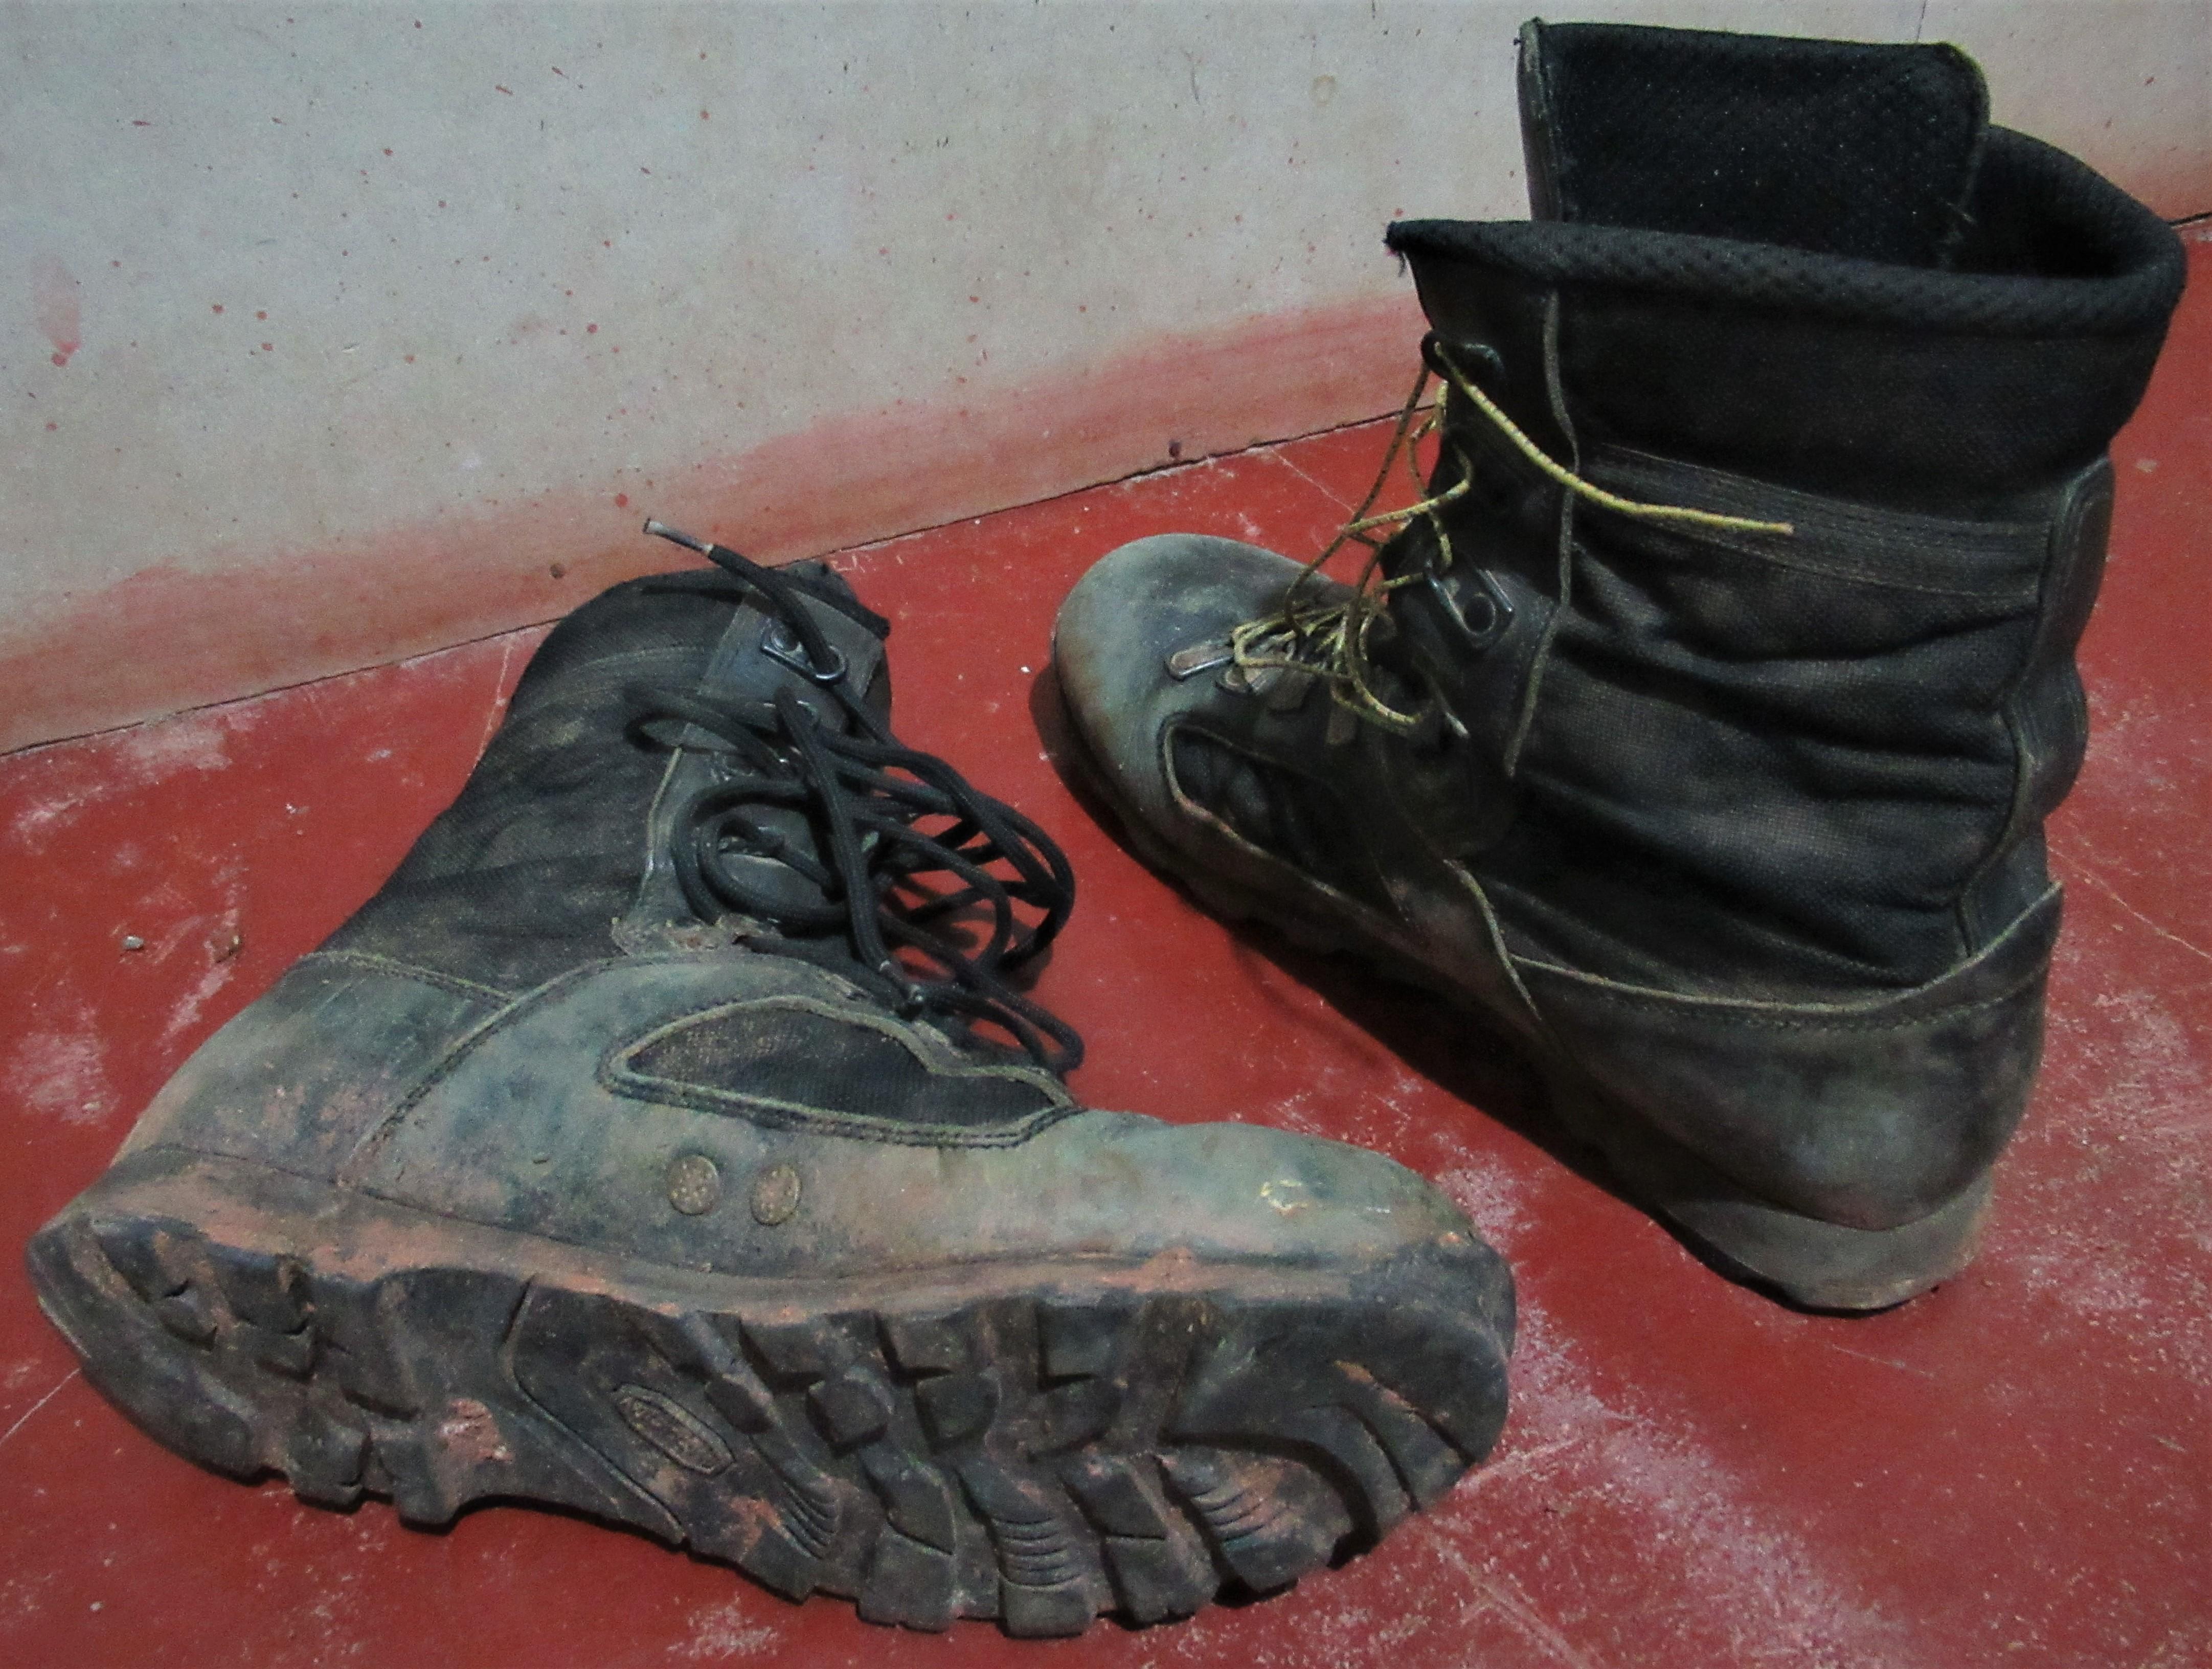 1eaa5e46c5c LOWA Elite Jungle Boots Review – The Field Biologist